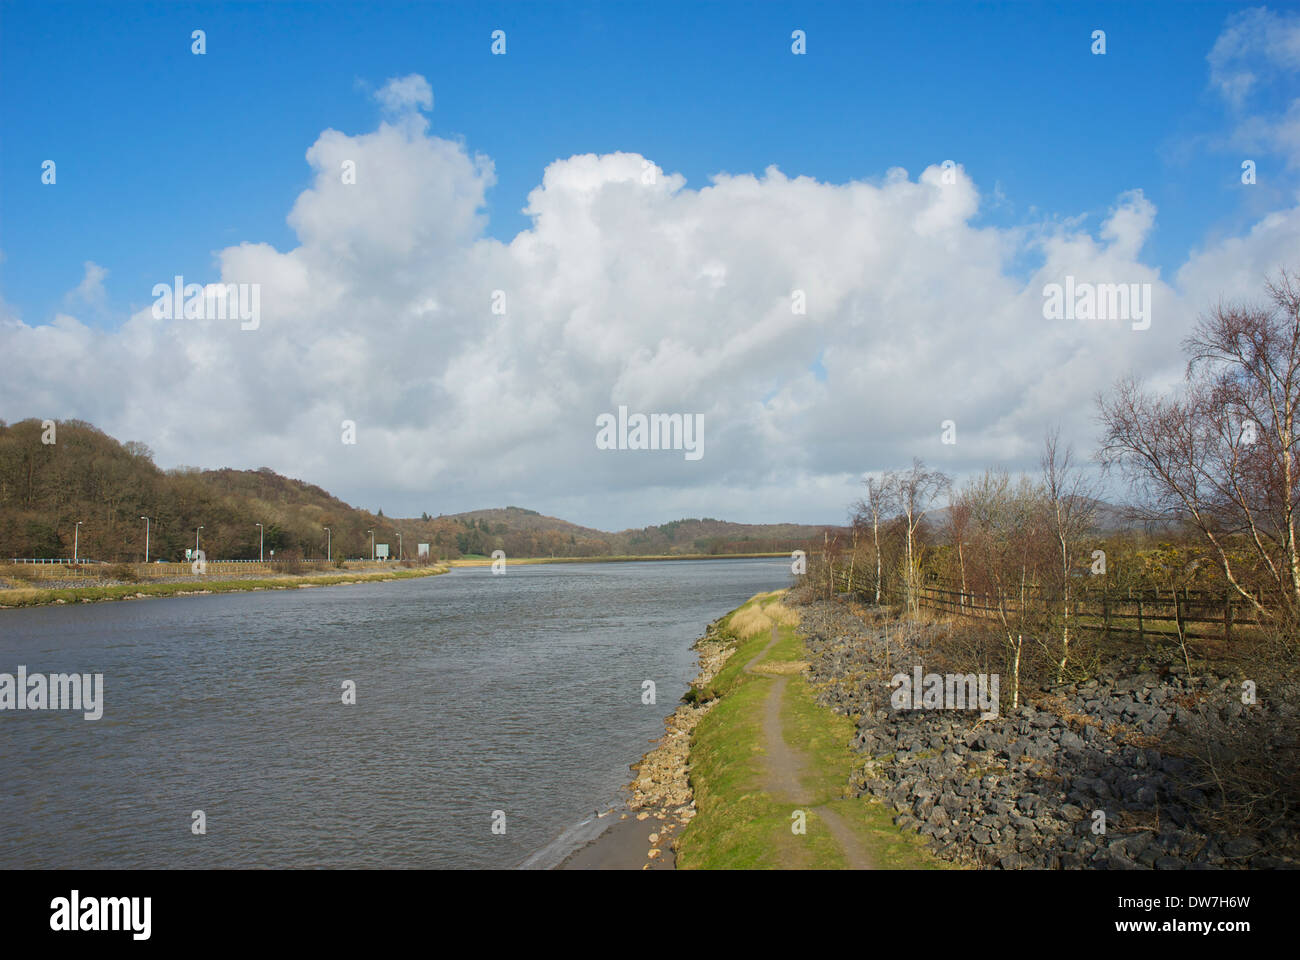 The tidal estuary of the River Leven at Greenodd, South Lakeland, Cumbria, England UK Stock Photo